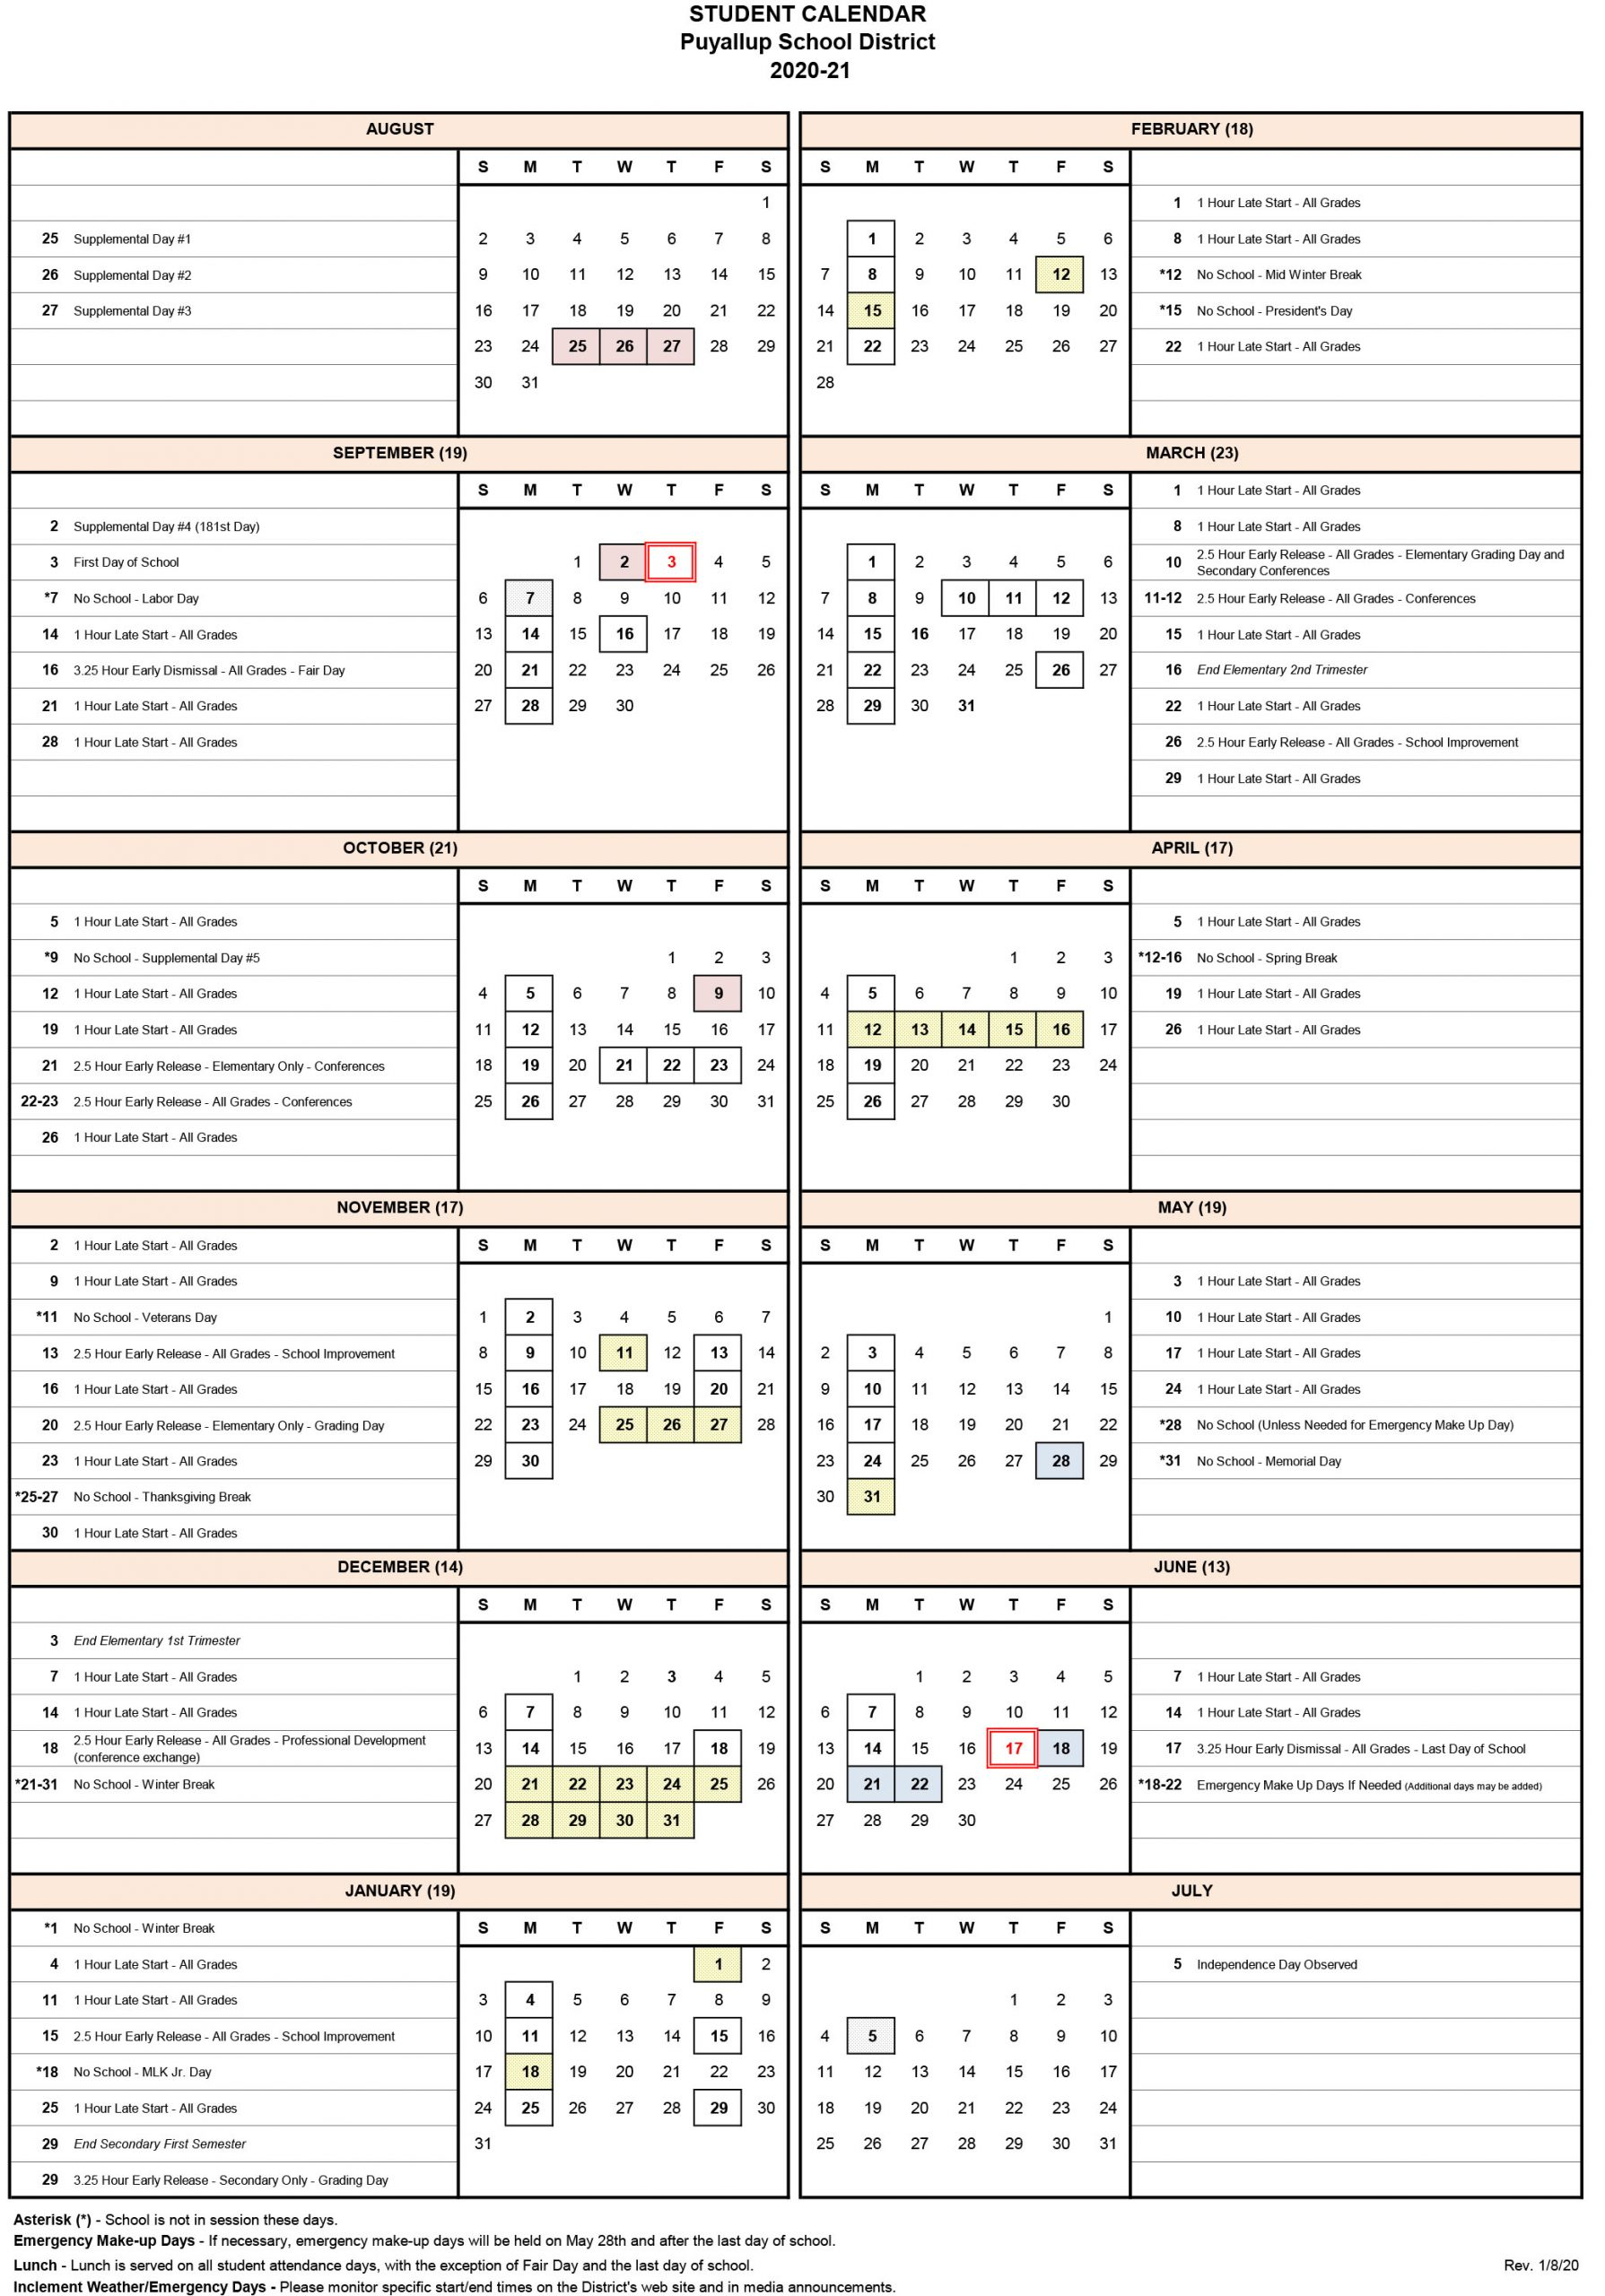 Ny Times Editorial Calendar | Printable Calendar 2020 2021 With Regard To Turningstone Bingo Schedule Feb 2020